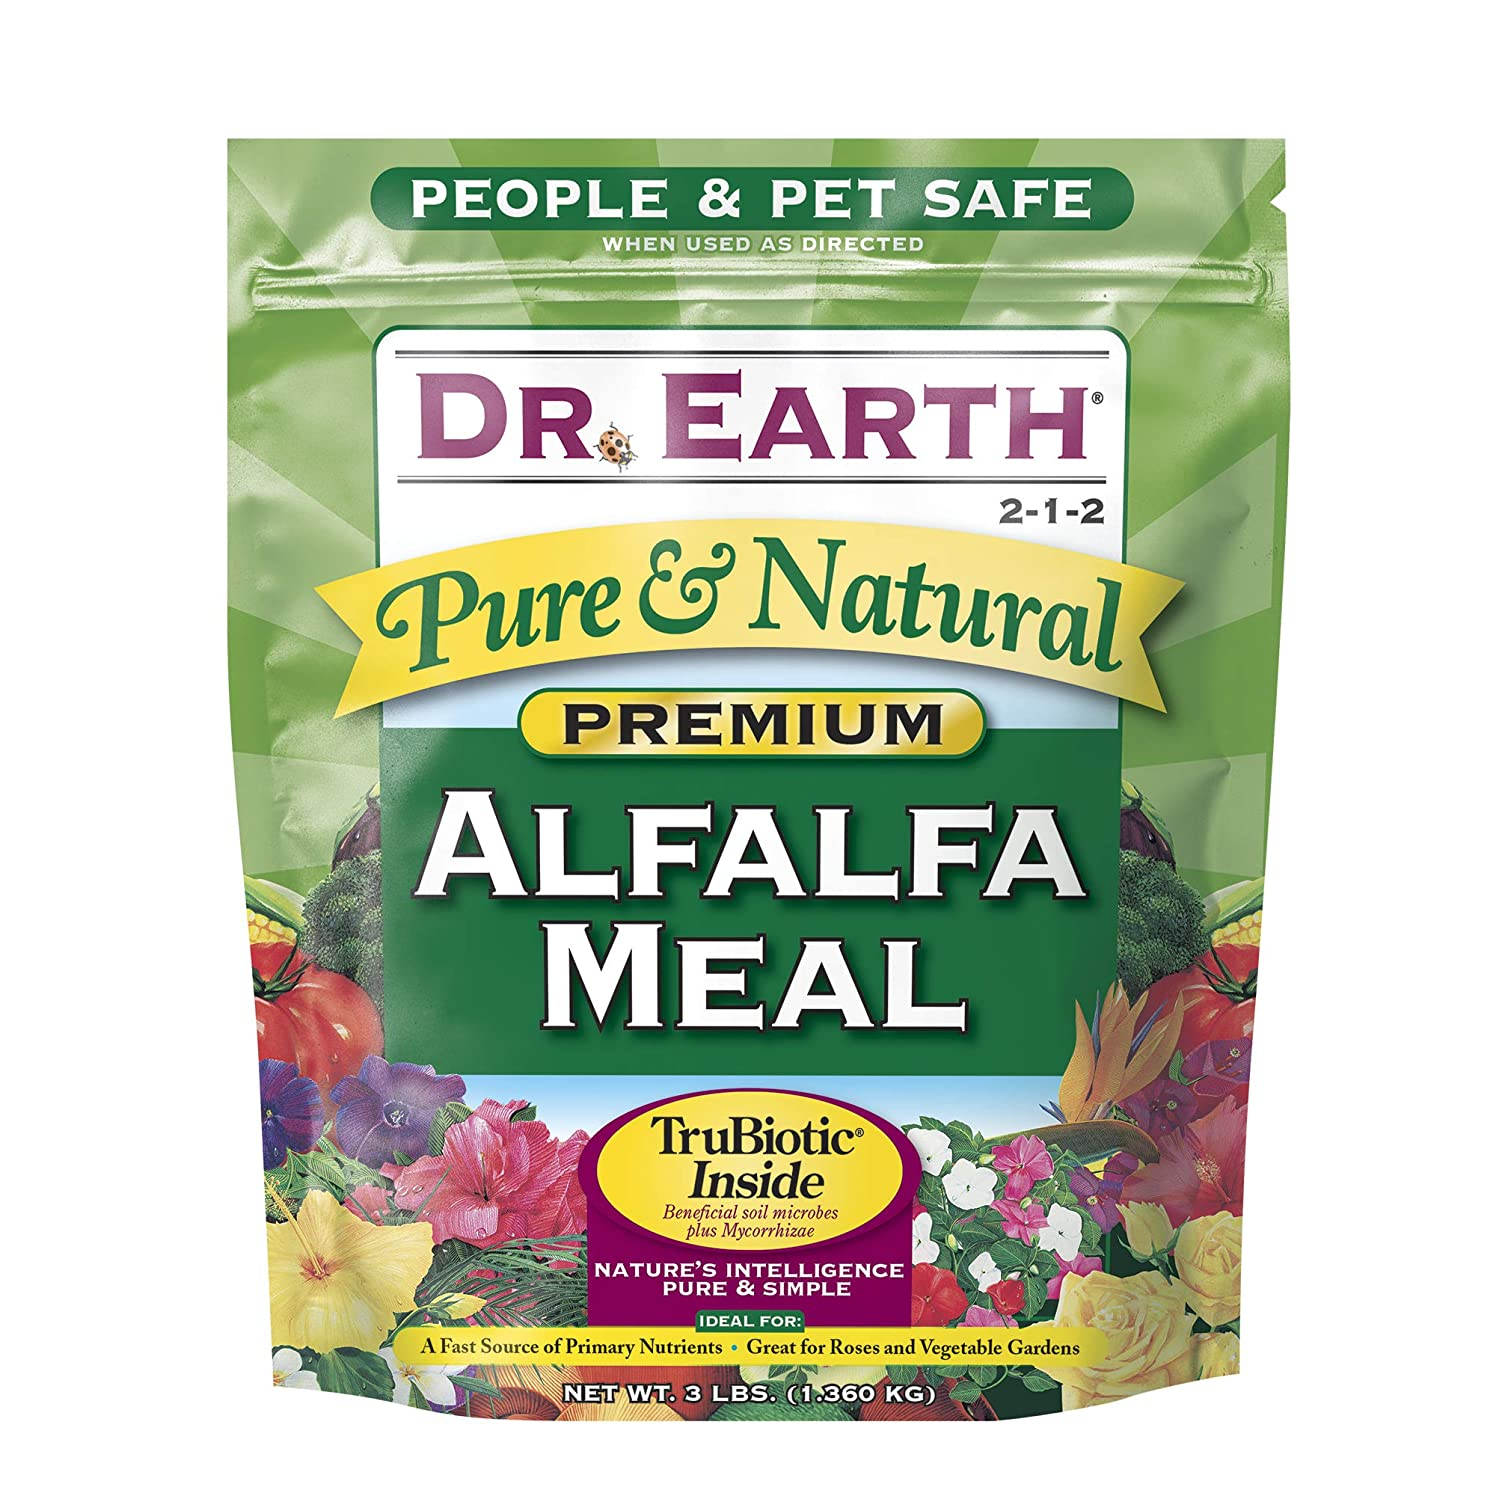 Dr. Earth Pure & Natural Alfalfa Meal 3 lb